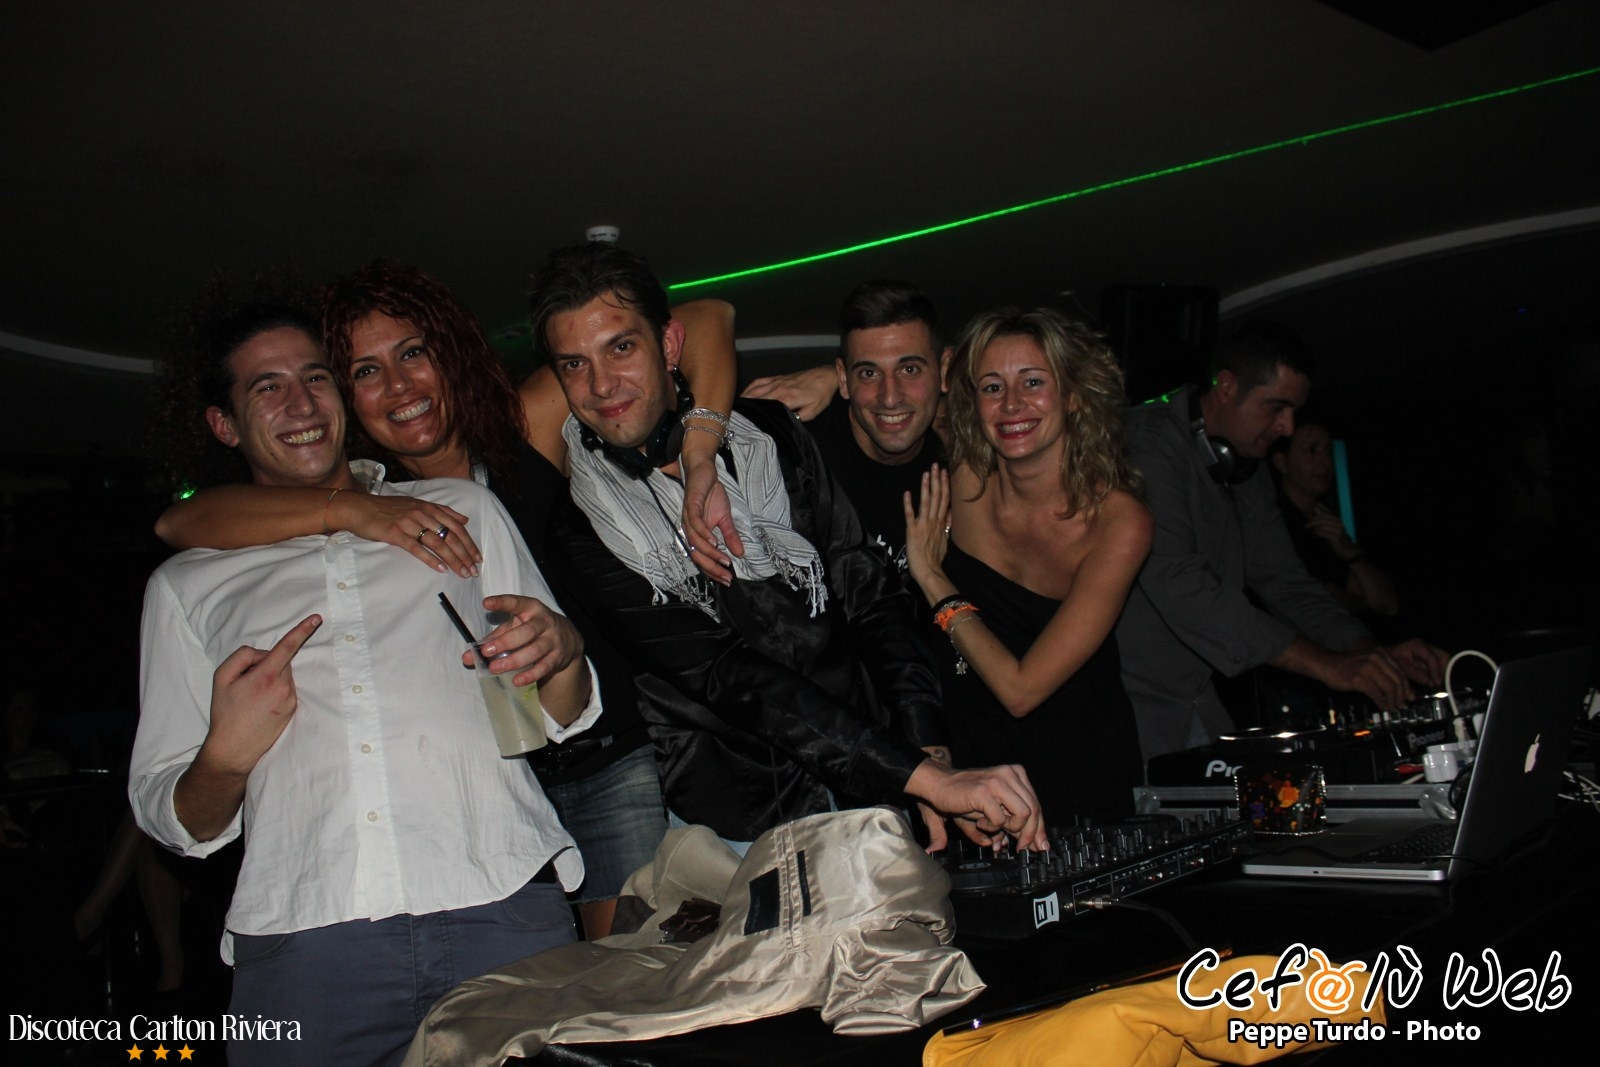 Discoteca Carlton Riviera: 03 Ottobre 2012 [Foto]